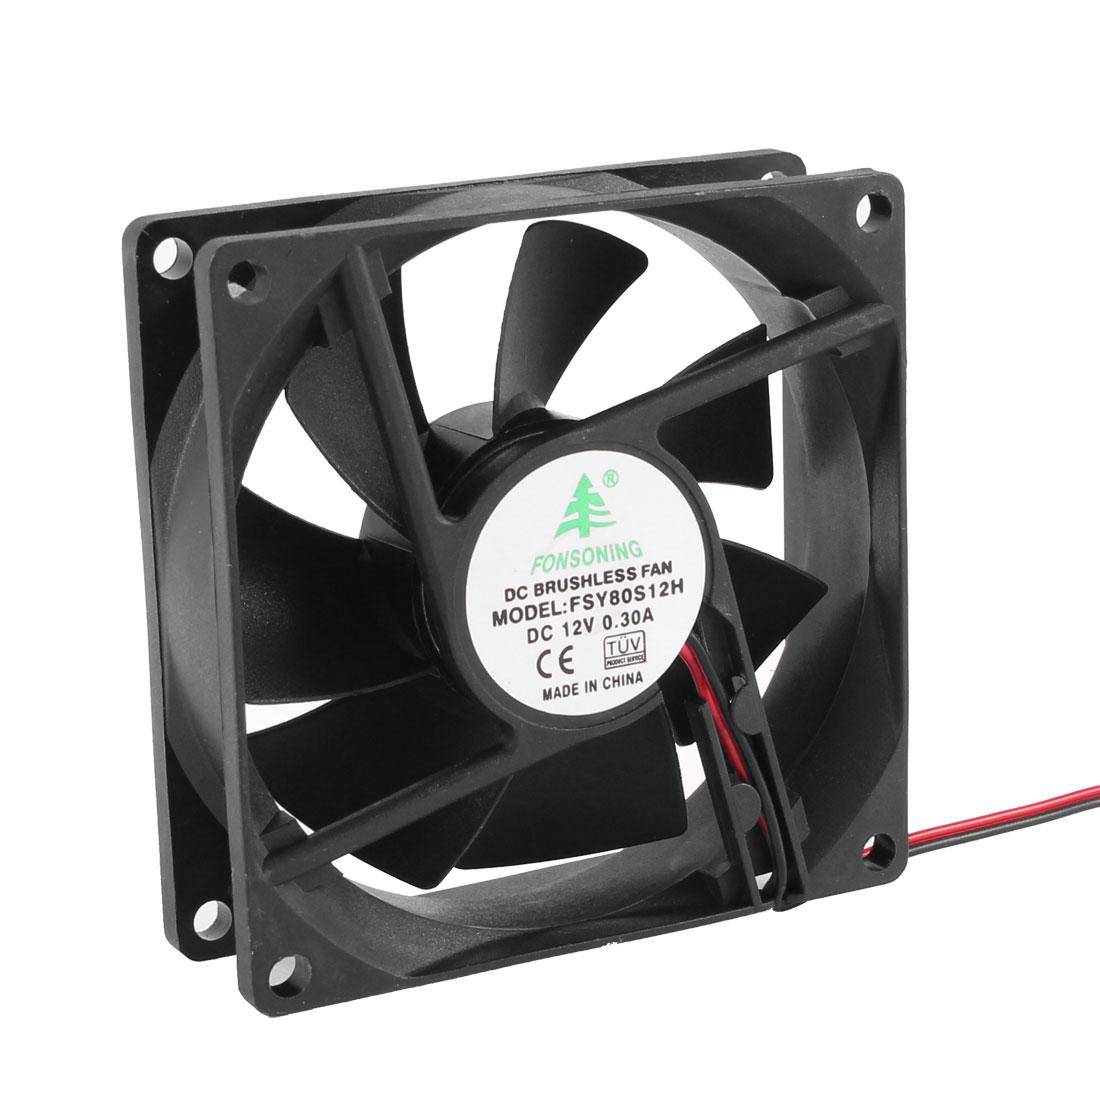 8cm 80mm DC 12V 2 Terminal Brushless CPU Computer Case Cooling Cooler Fan